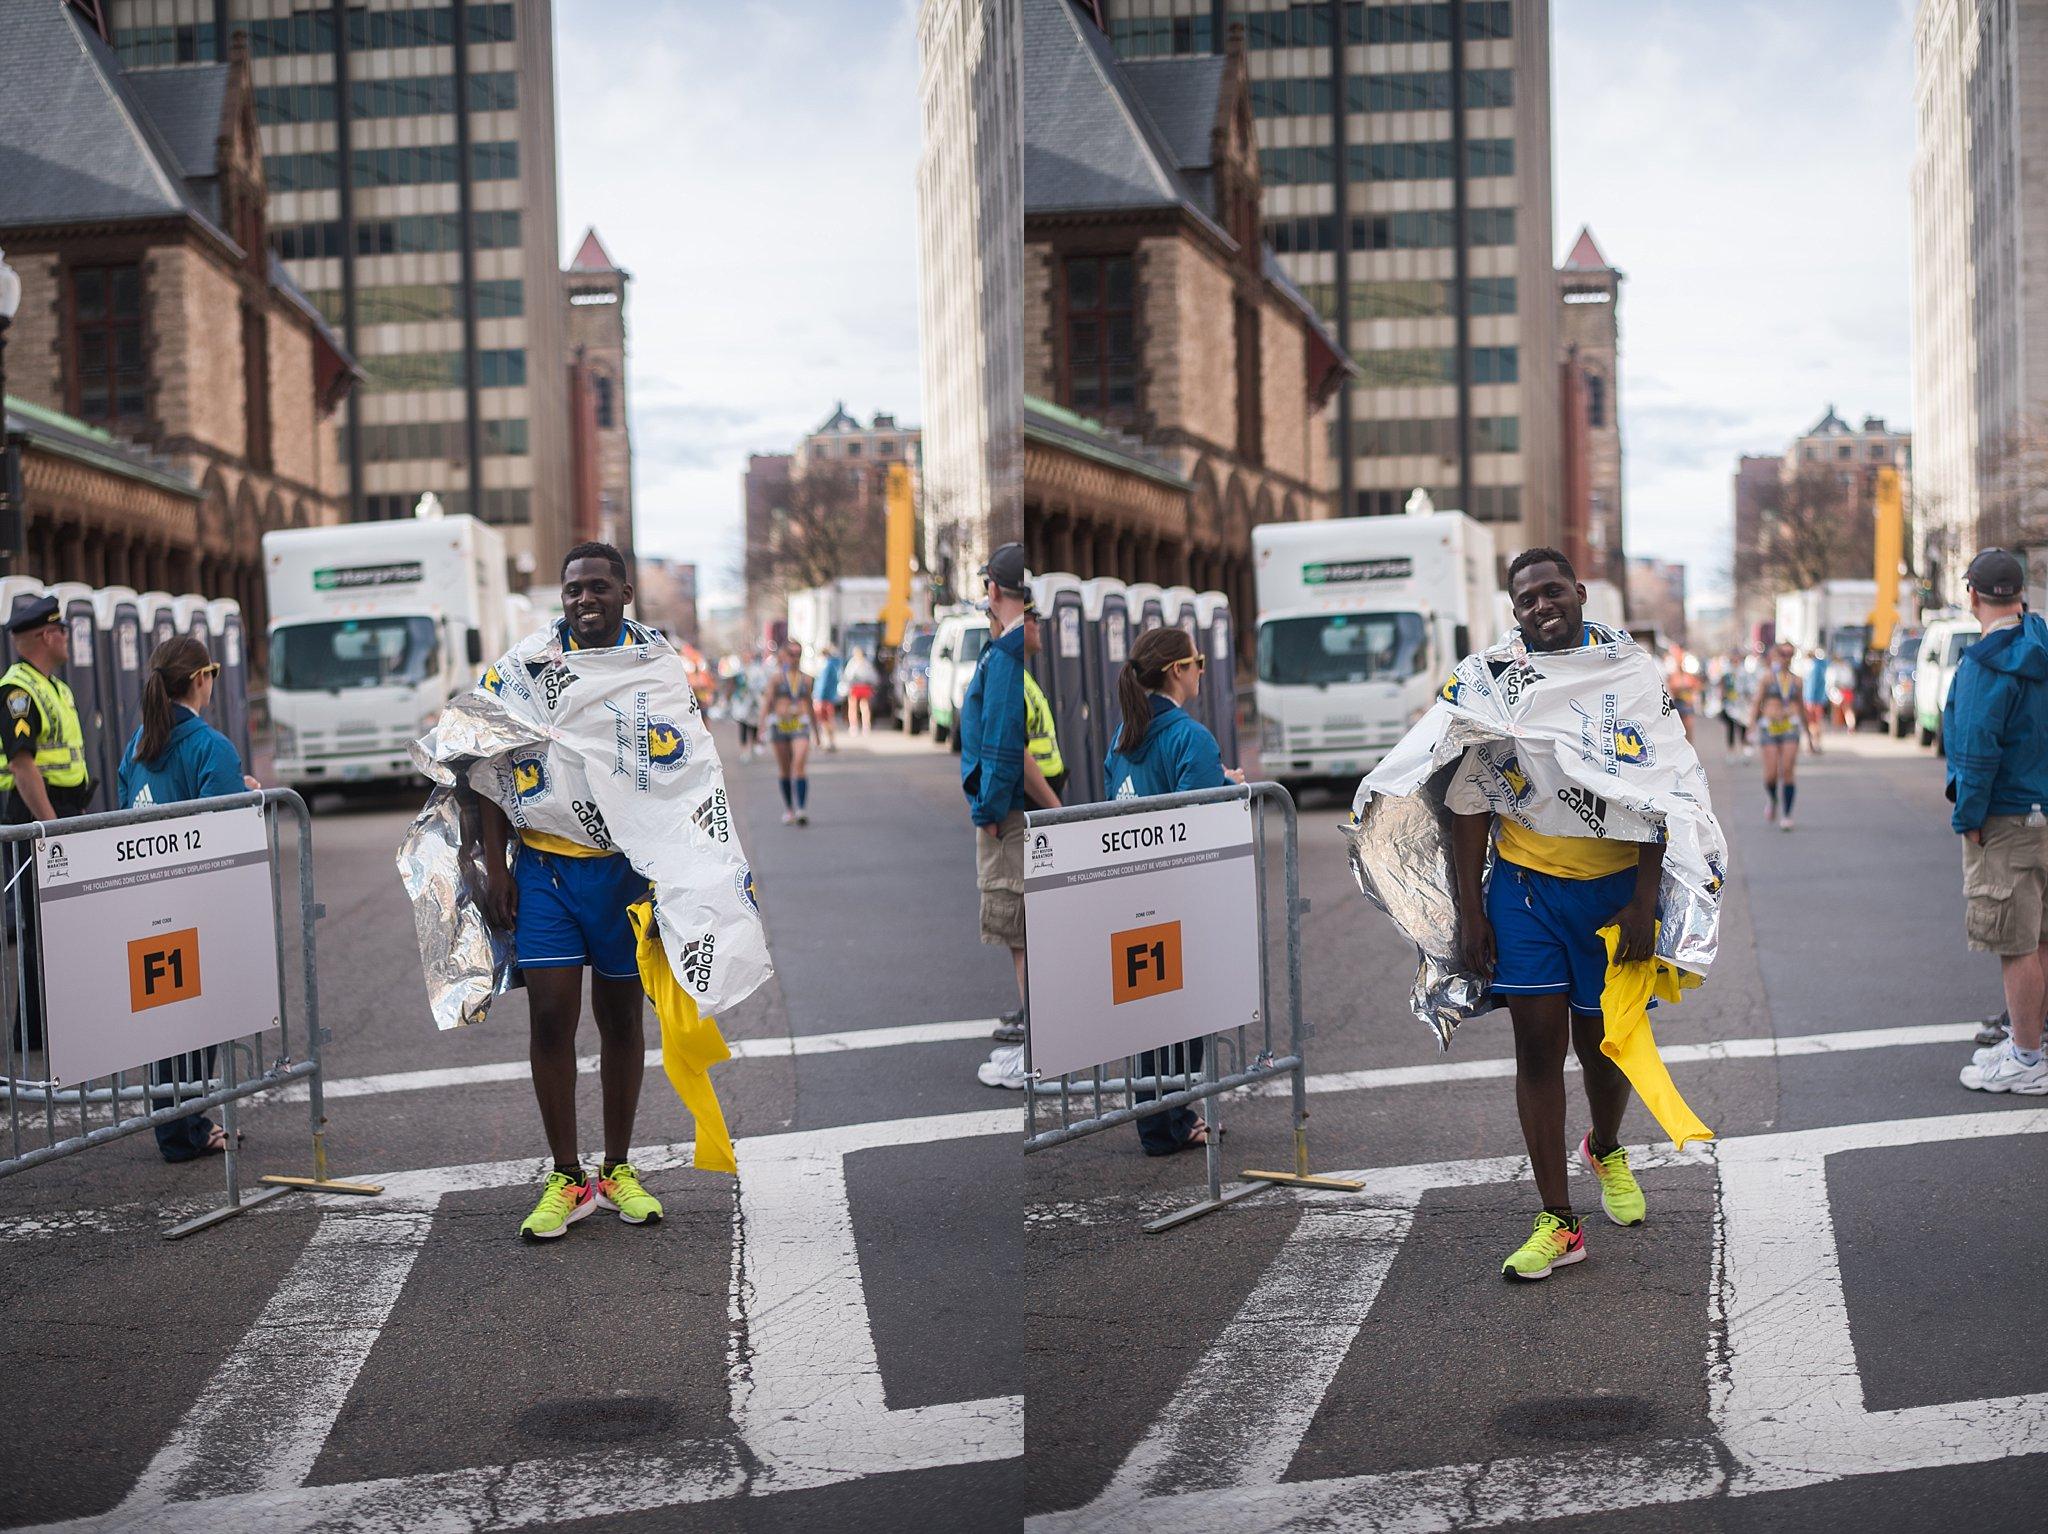 Crossing the marathon finish line